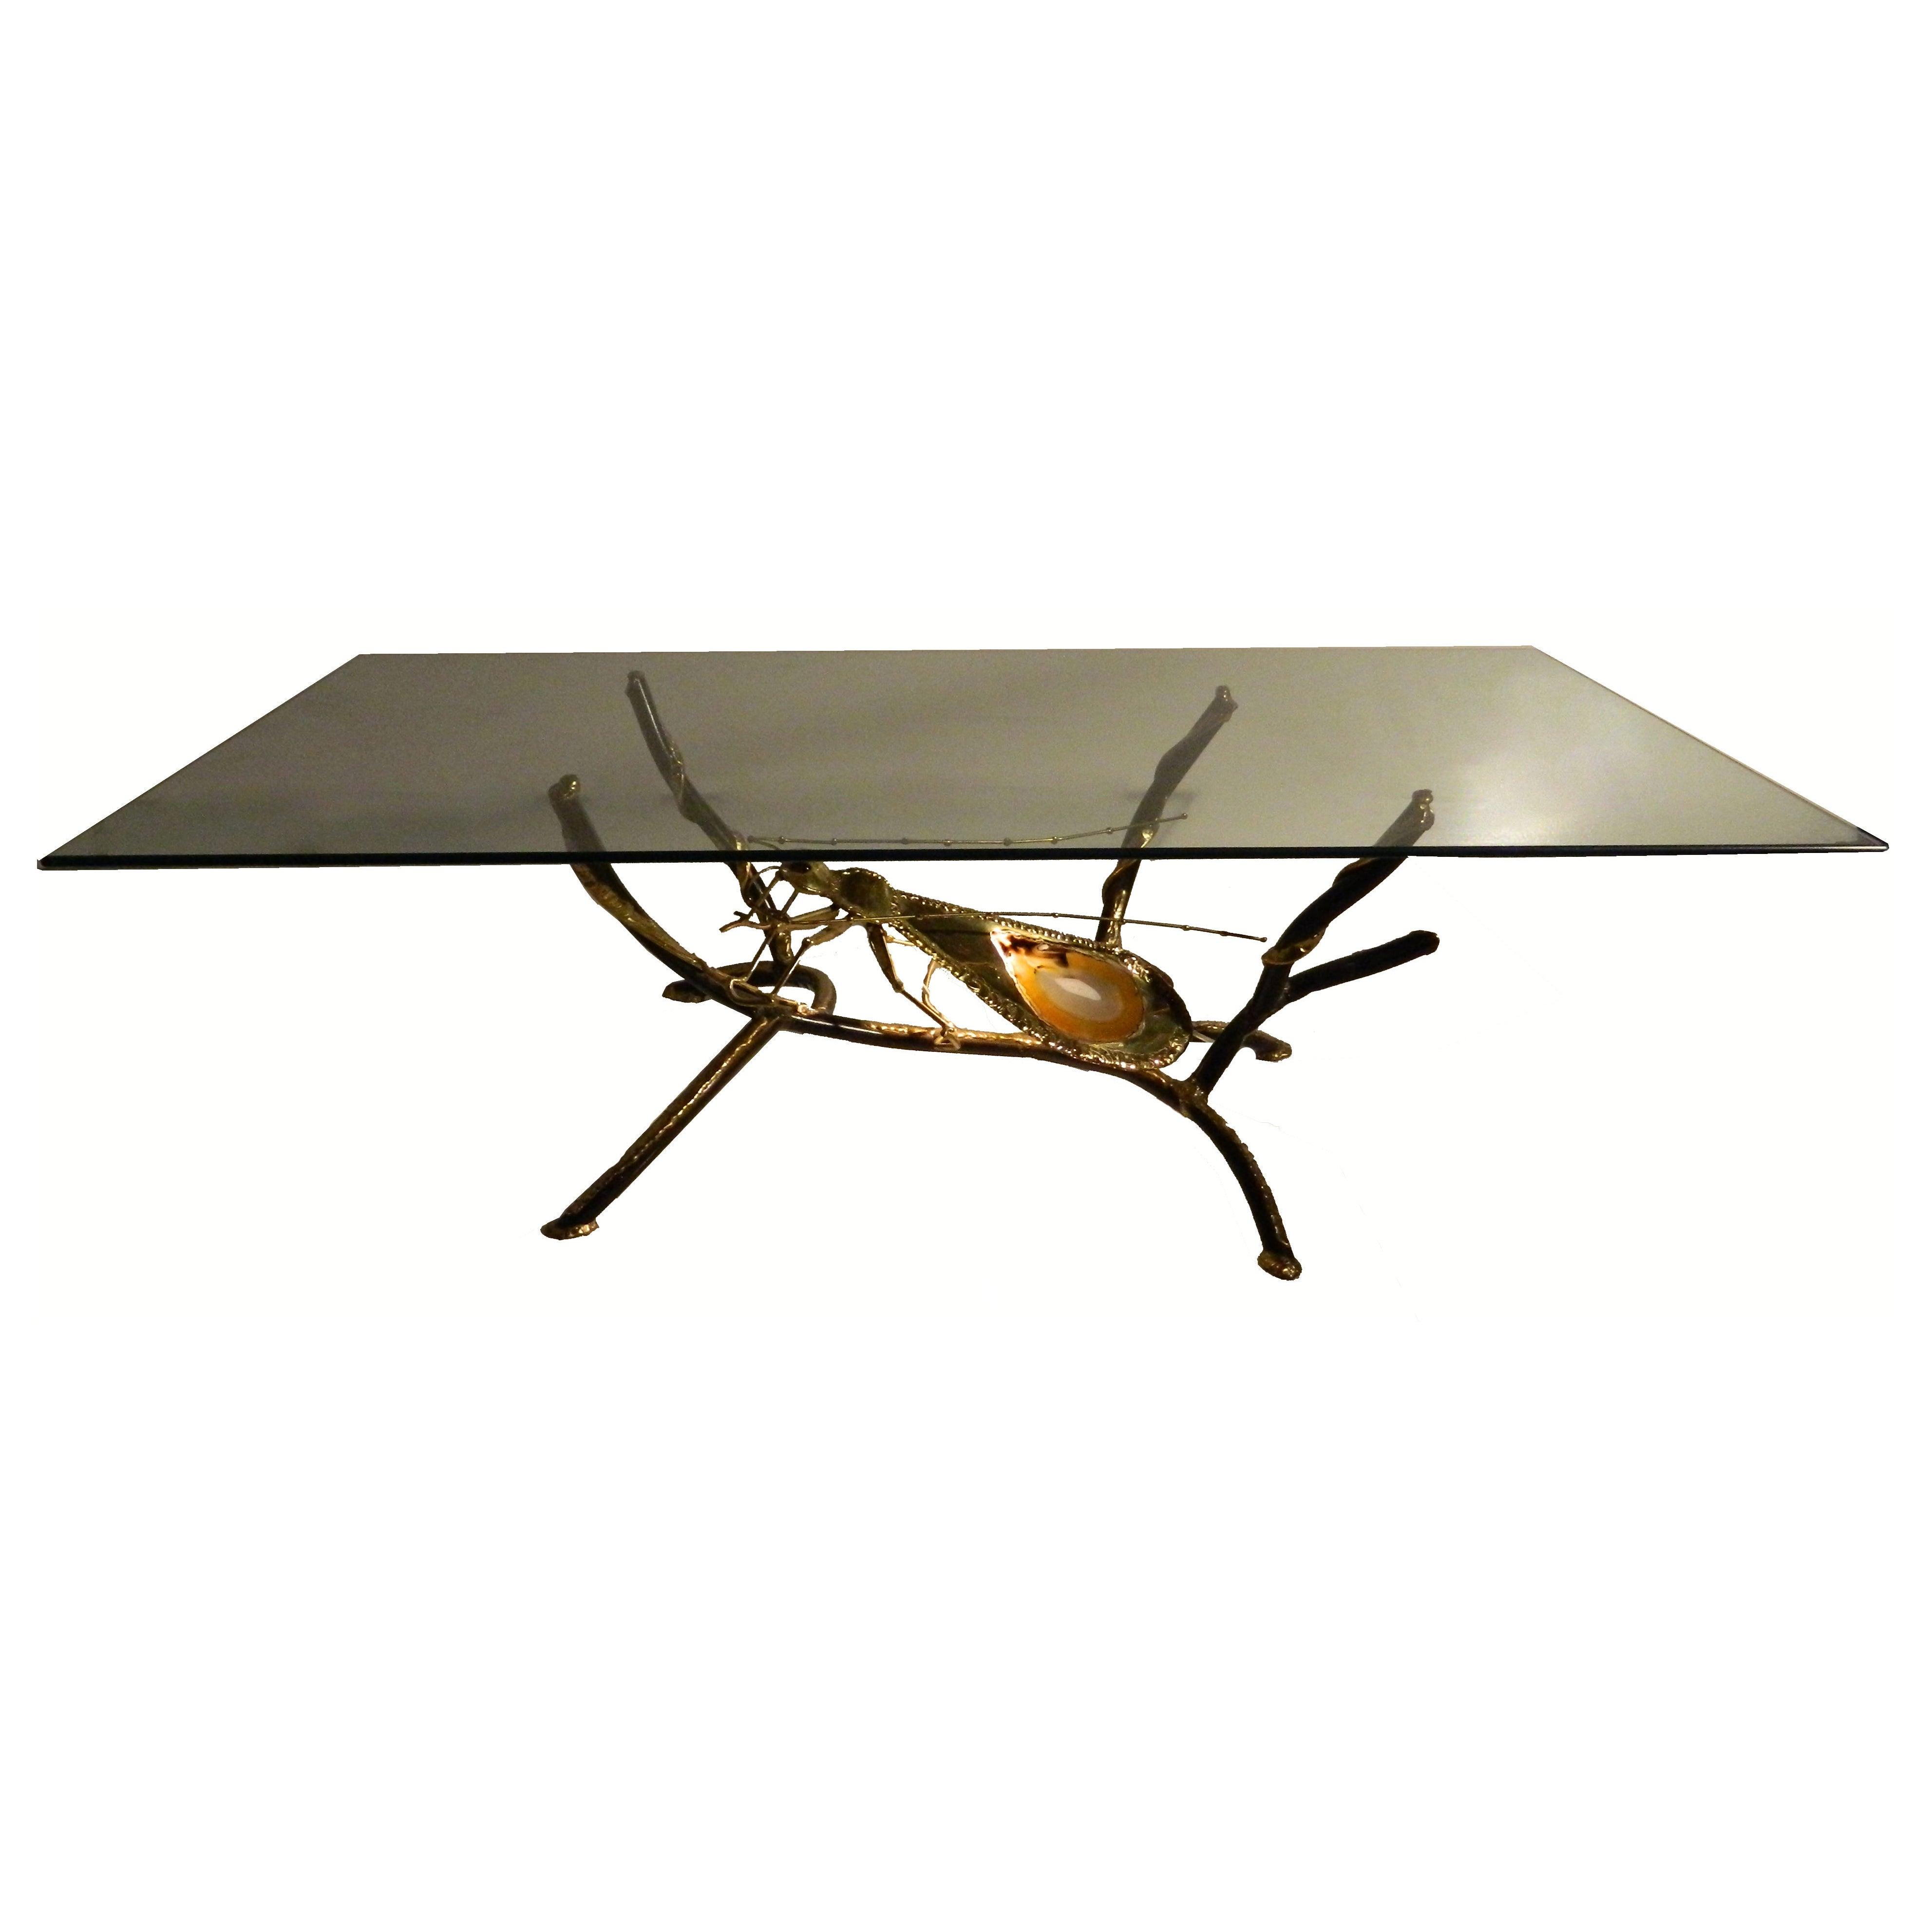 Henri Fernandez for Atelier Duval-Brasseur Huge Coffee Table Sculpture